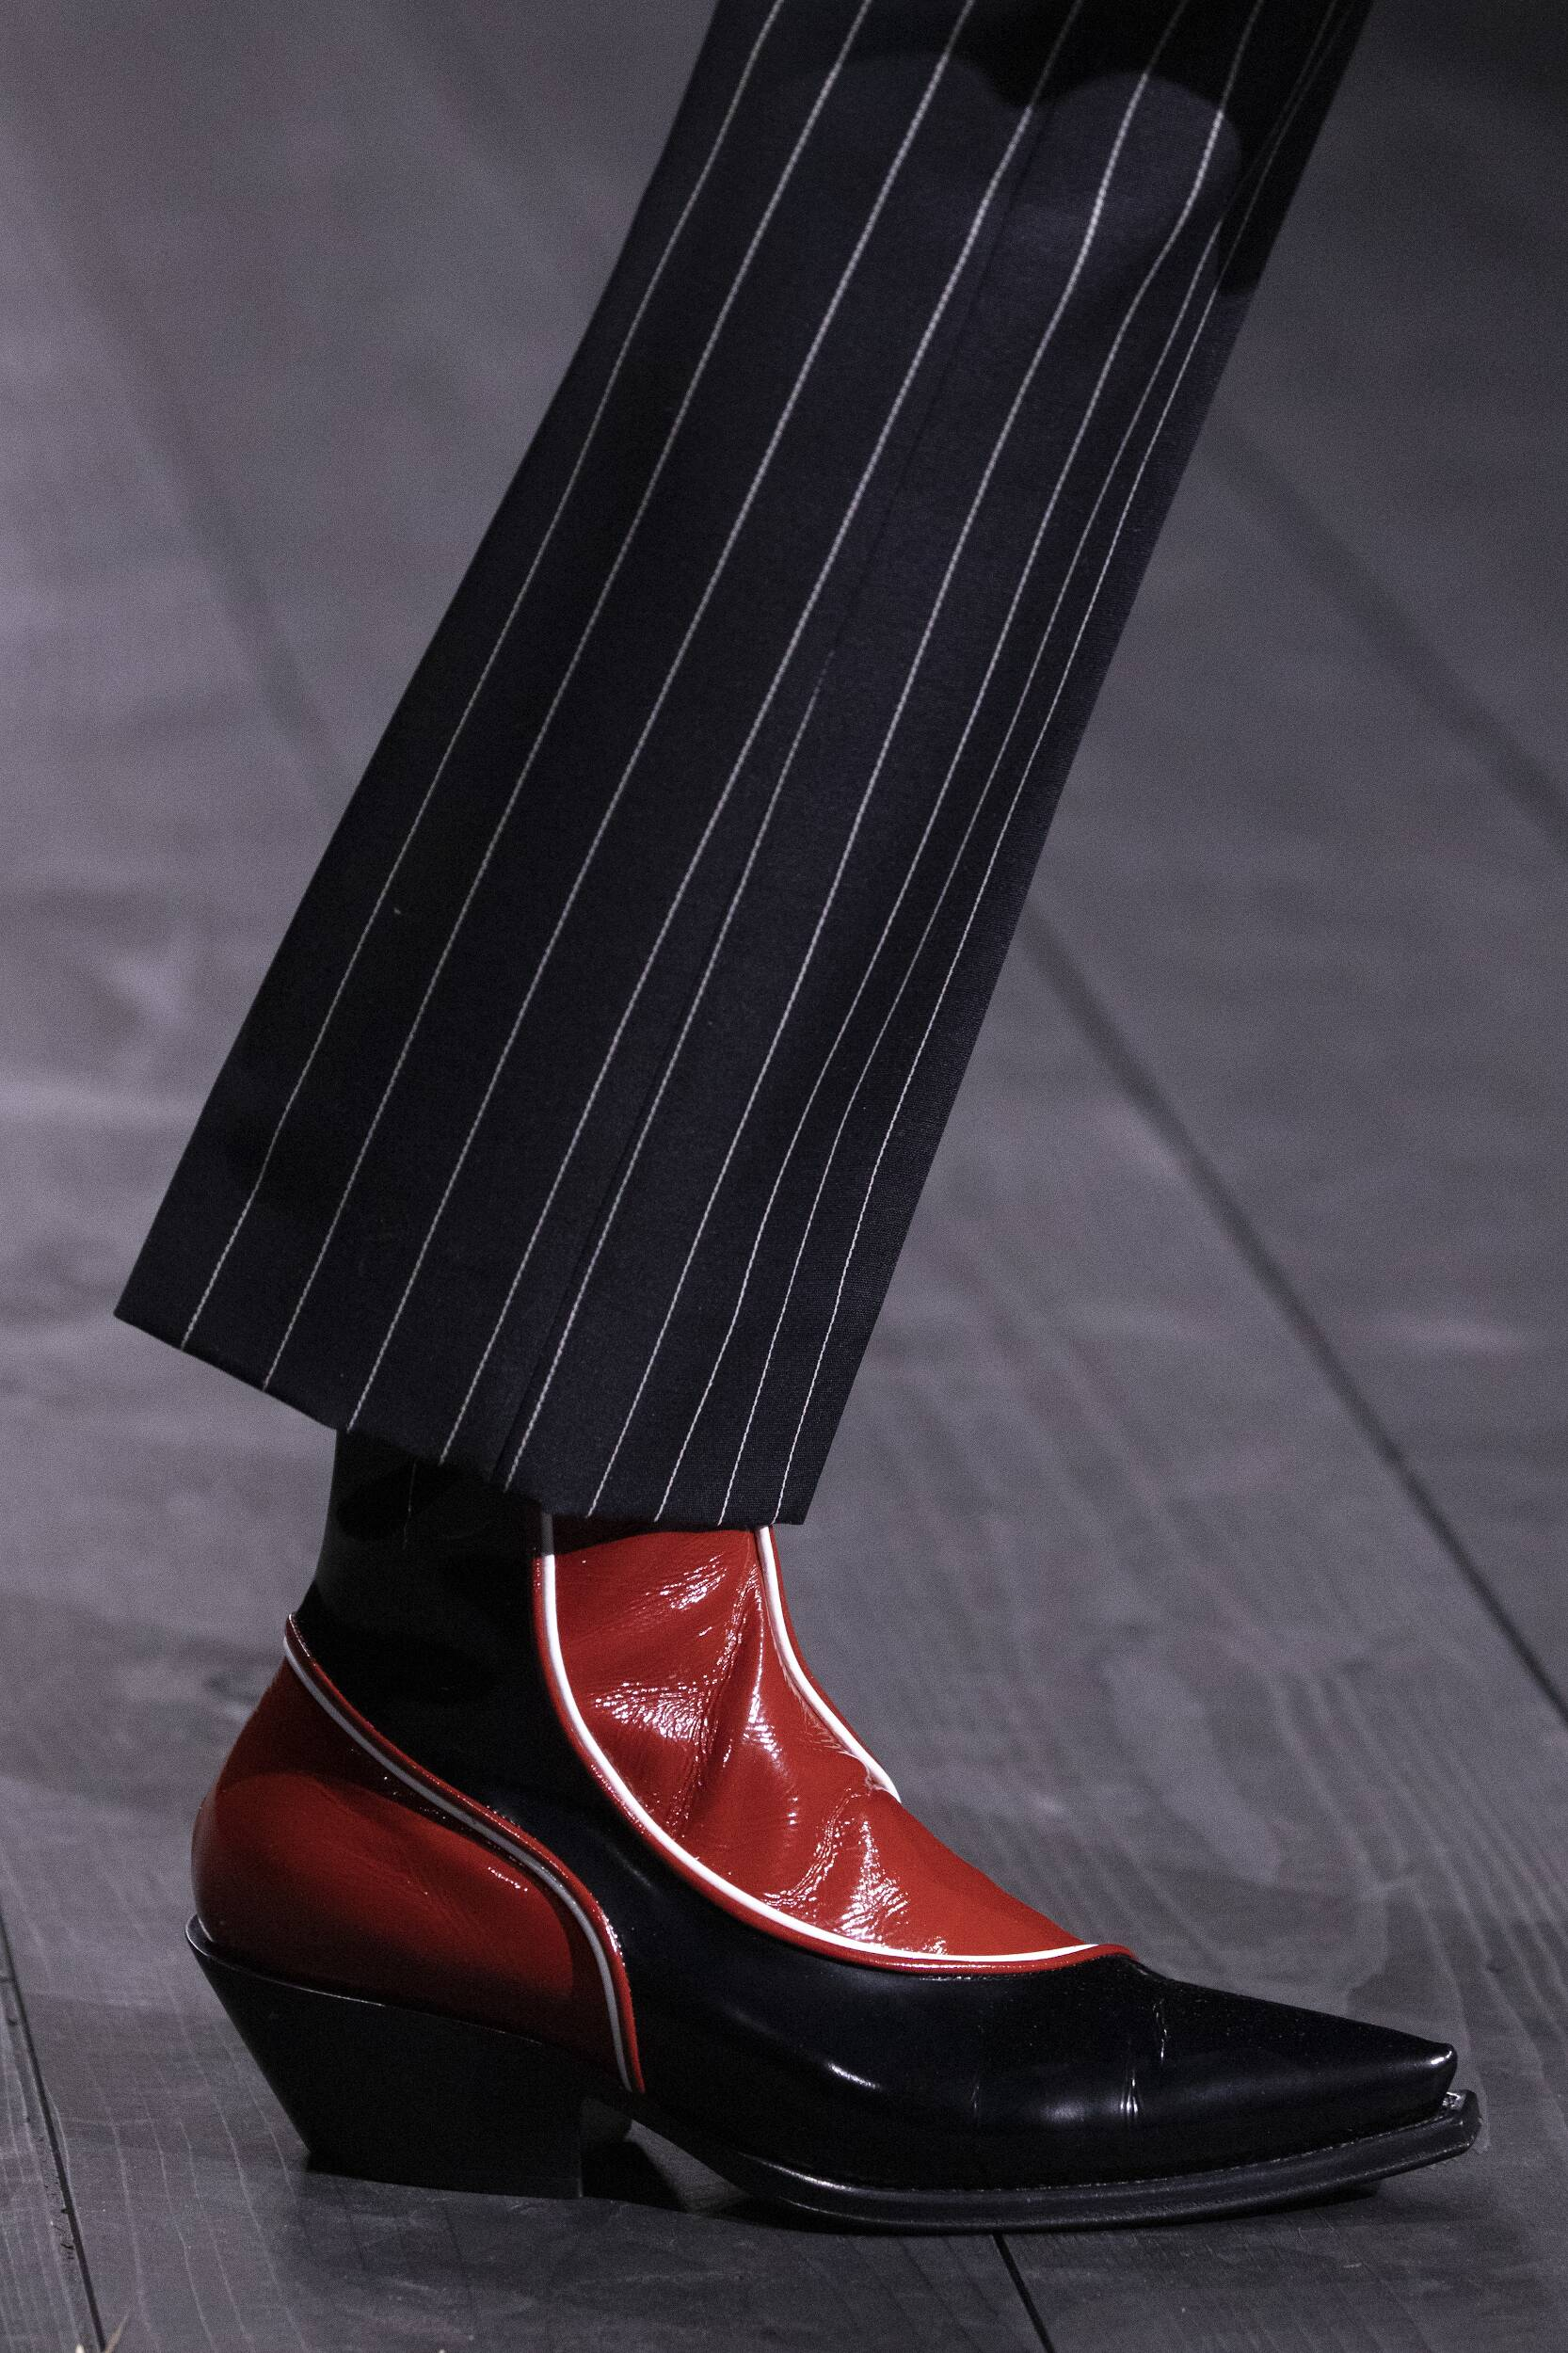 Detail Shoes Fall 2020 Louis Vuitton